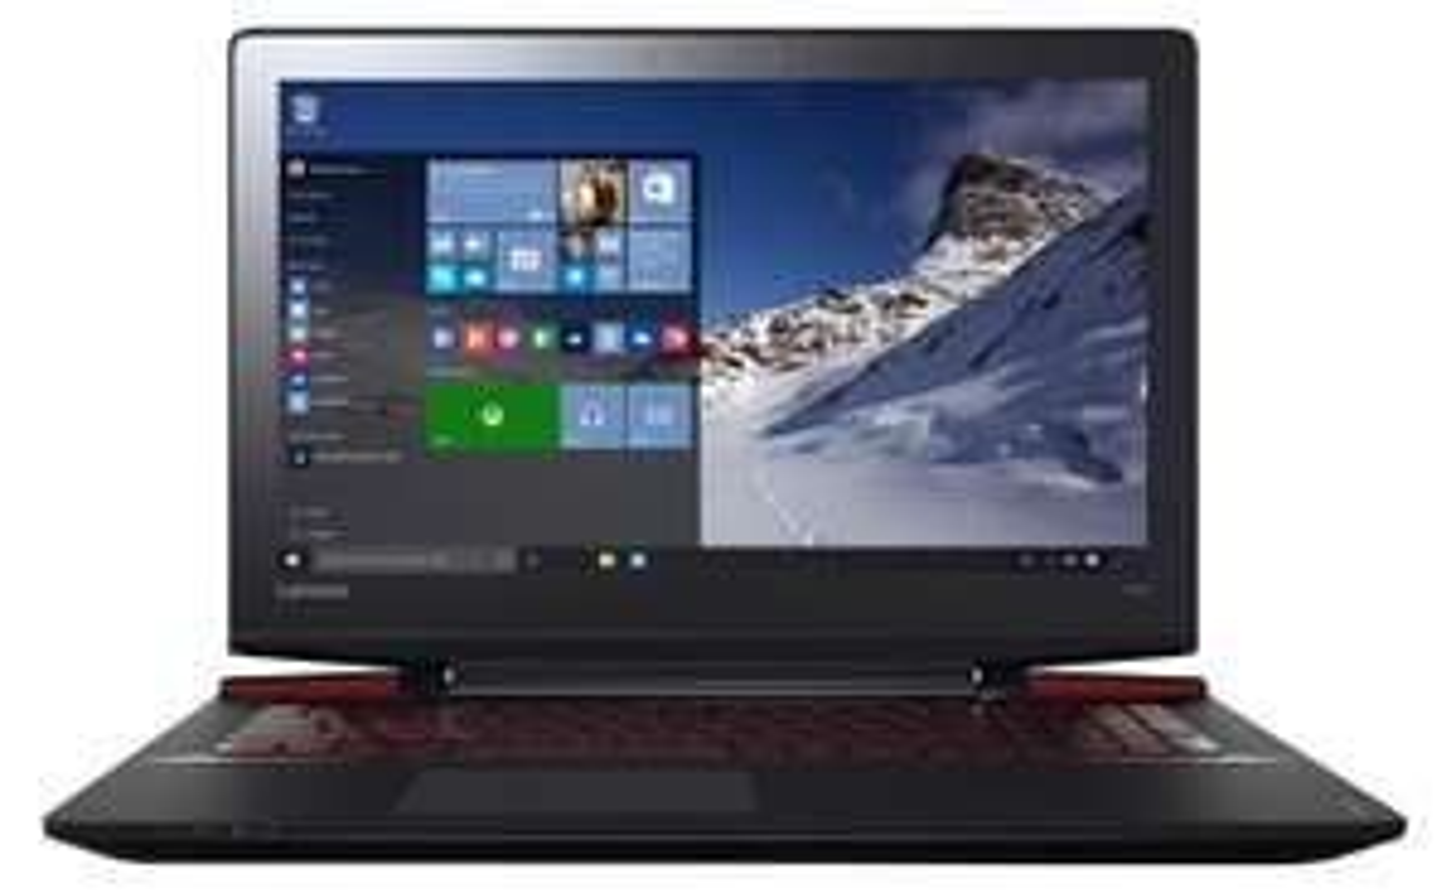 "PC portable gamer 15.6"" Lenovo IdeaPad Y700-15ISK (i7-6700HQ, GTX 960M, 8 Go de RAM, 256 Go en SSD)"